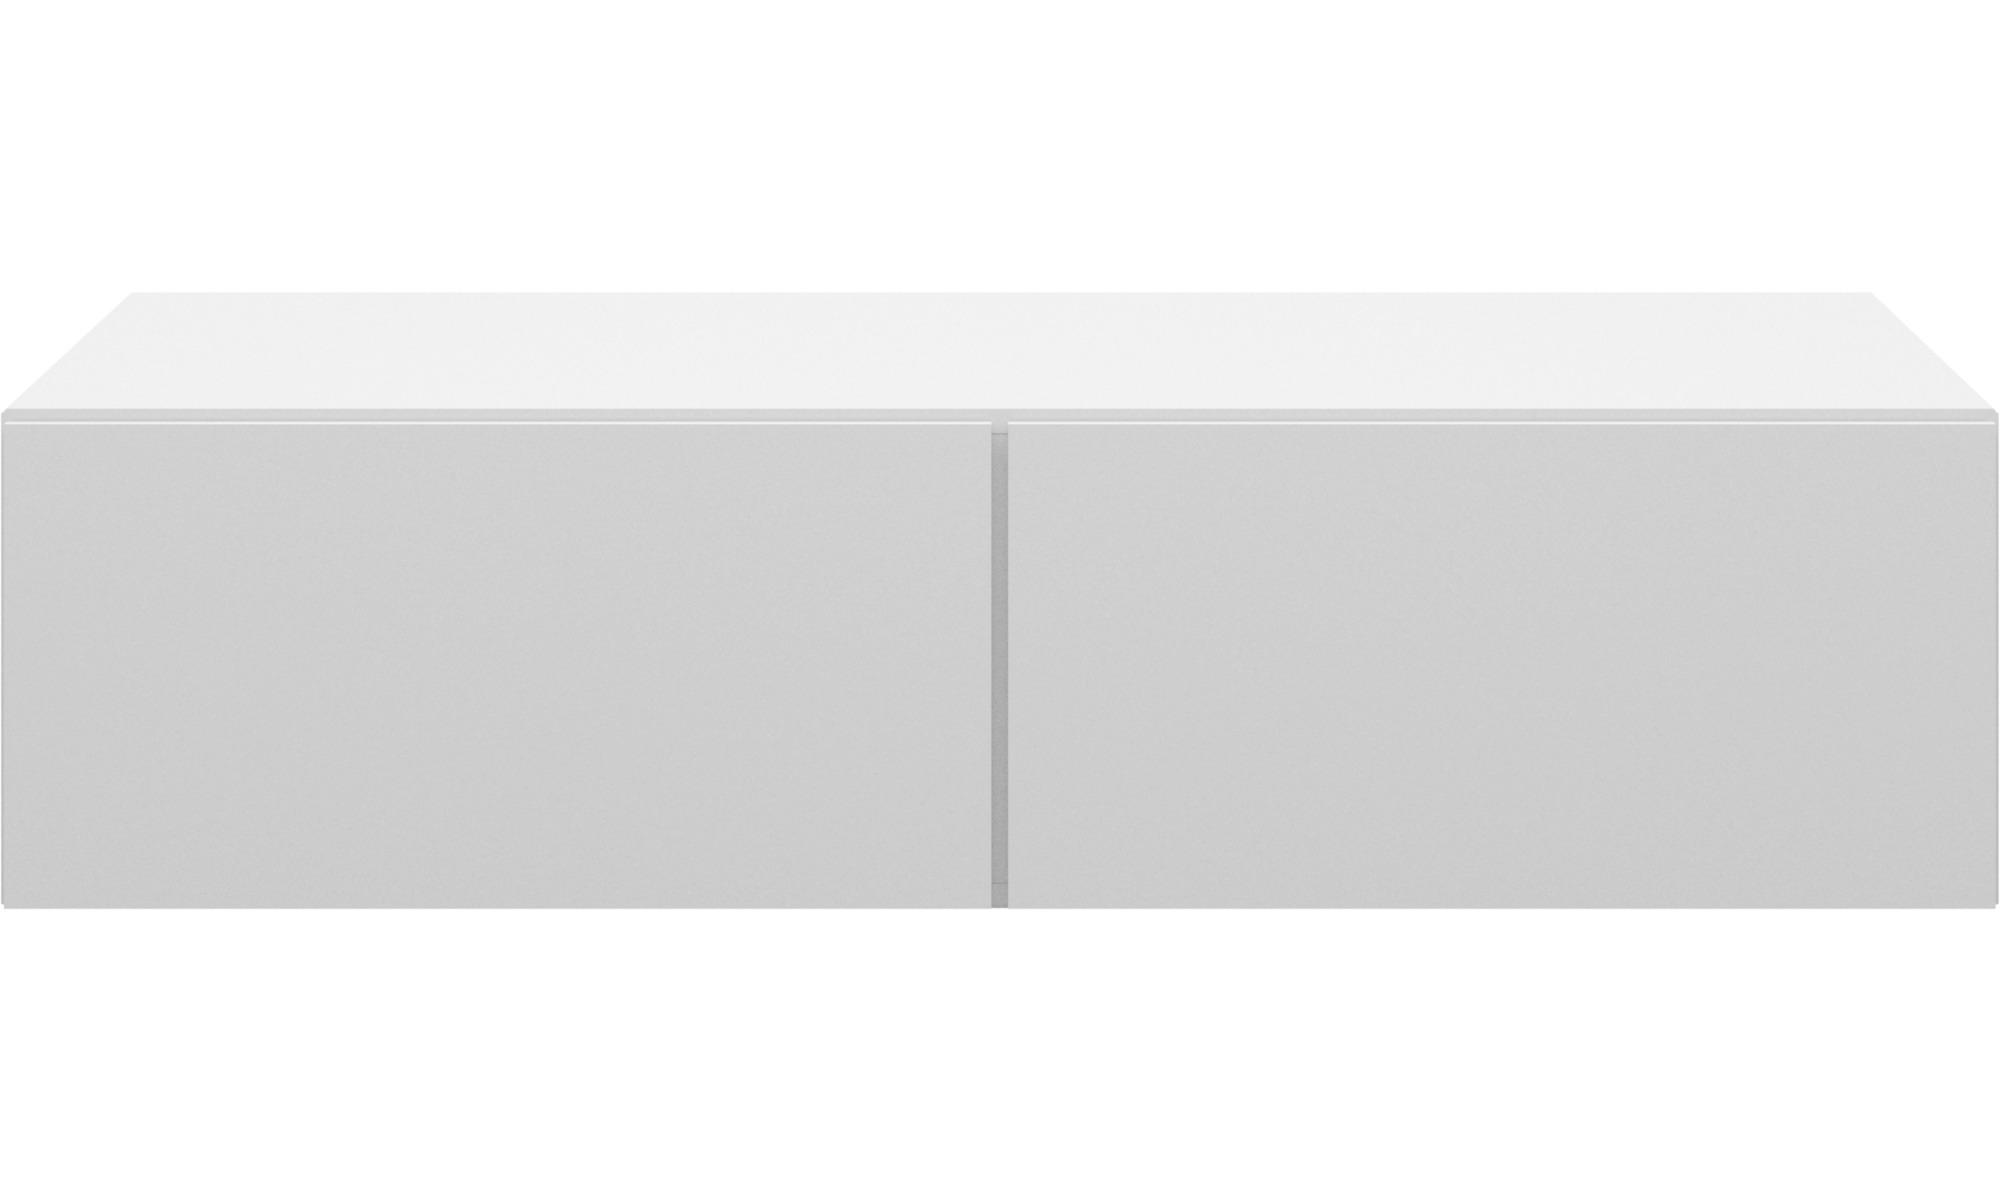 【Wallsystem】Lugano TVboard 60%off